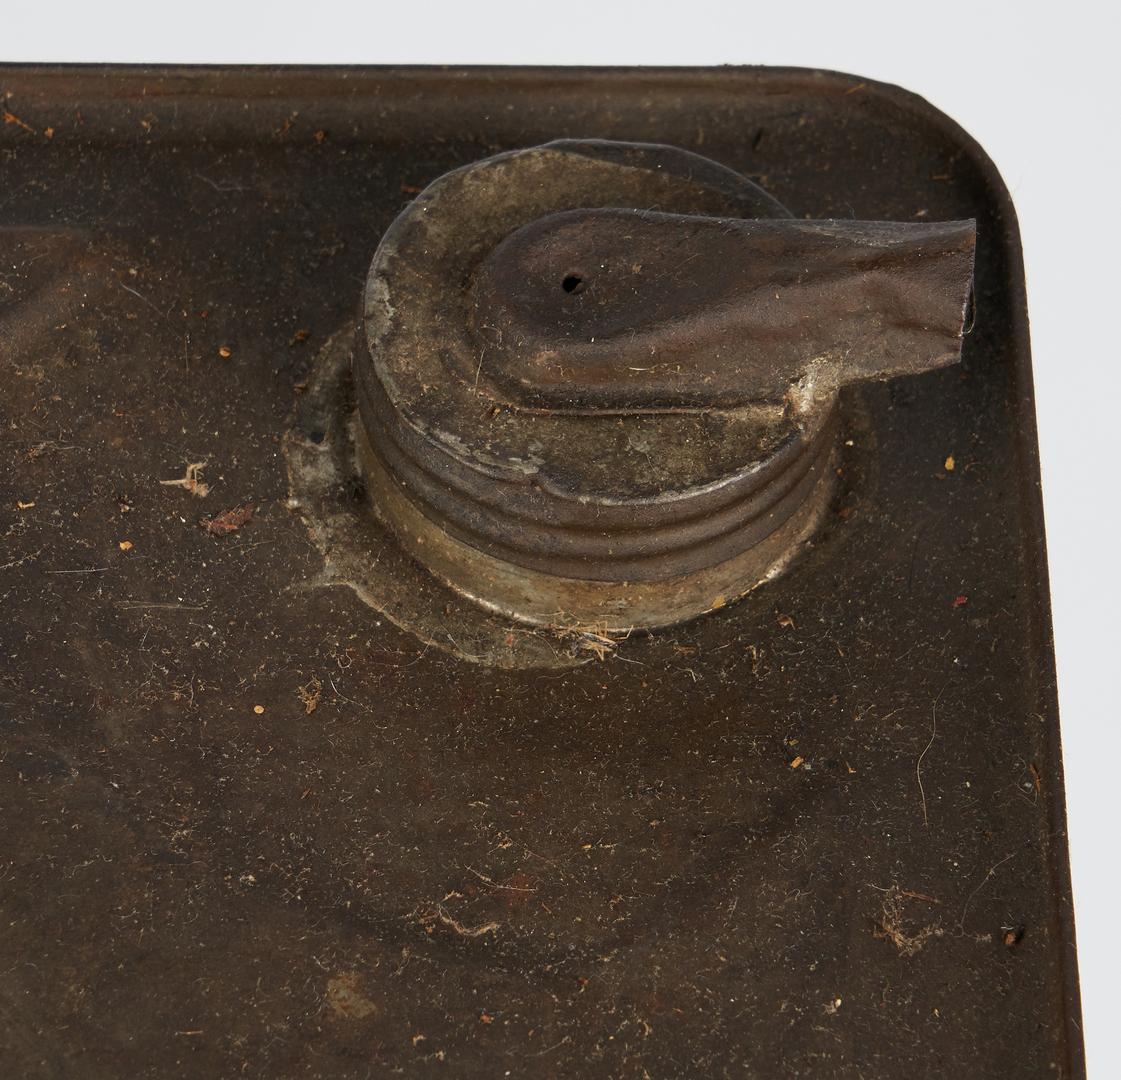 Lot 1177: 2 Havoline 5-Gallon Oil Cans & Crate